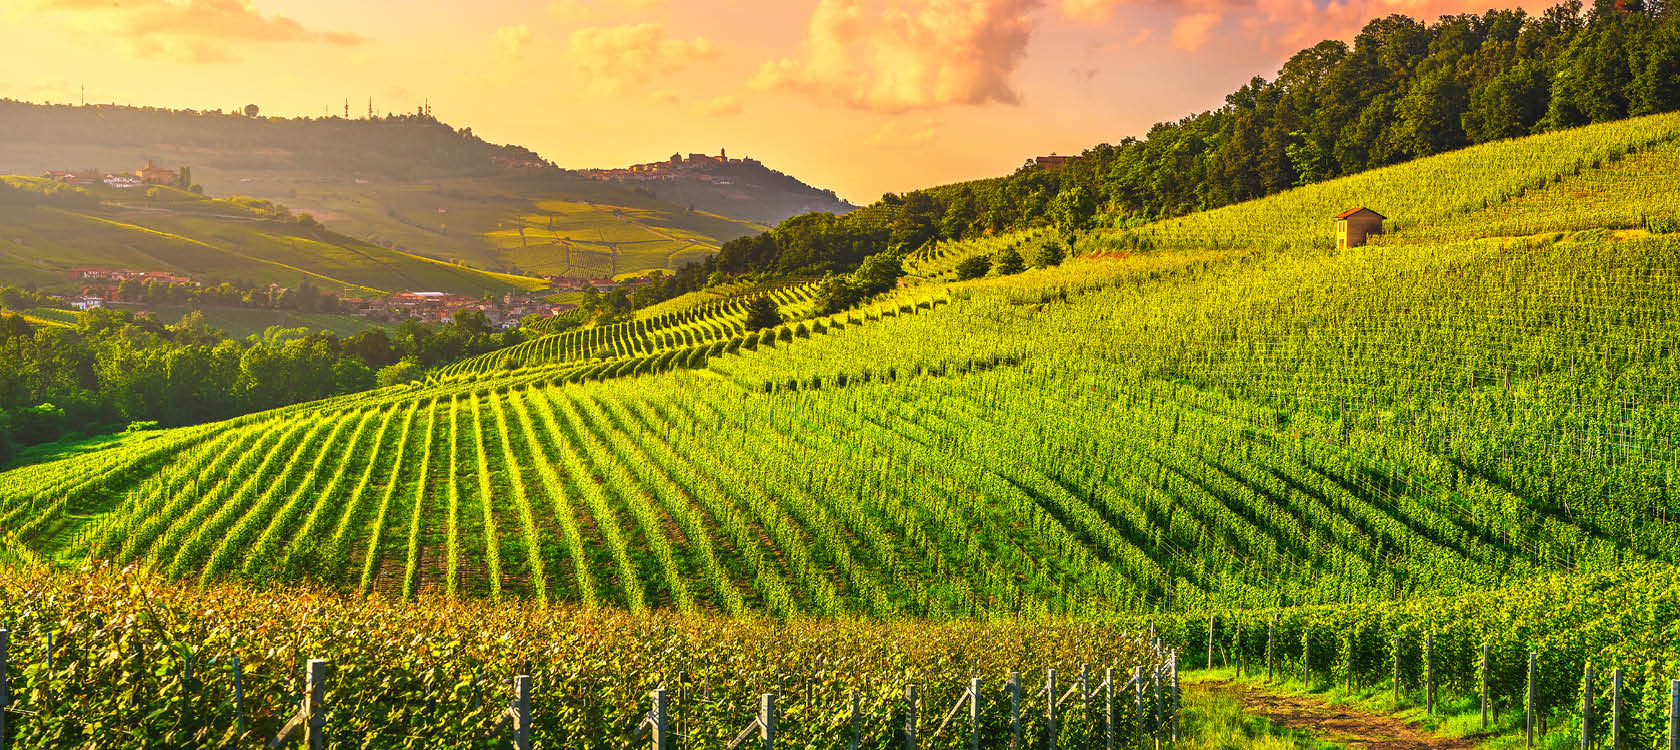 Oplev det eventyrlige landskab i Piemonte regionen